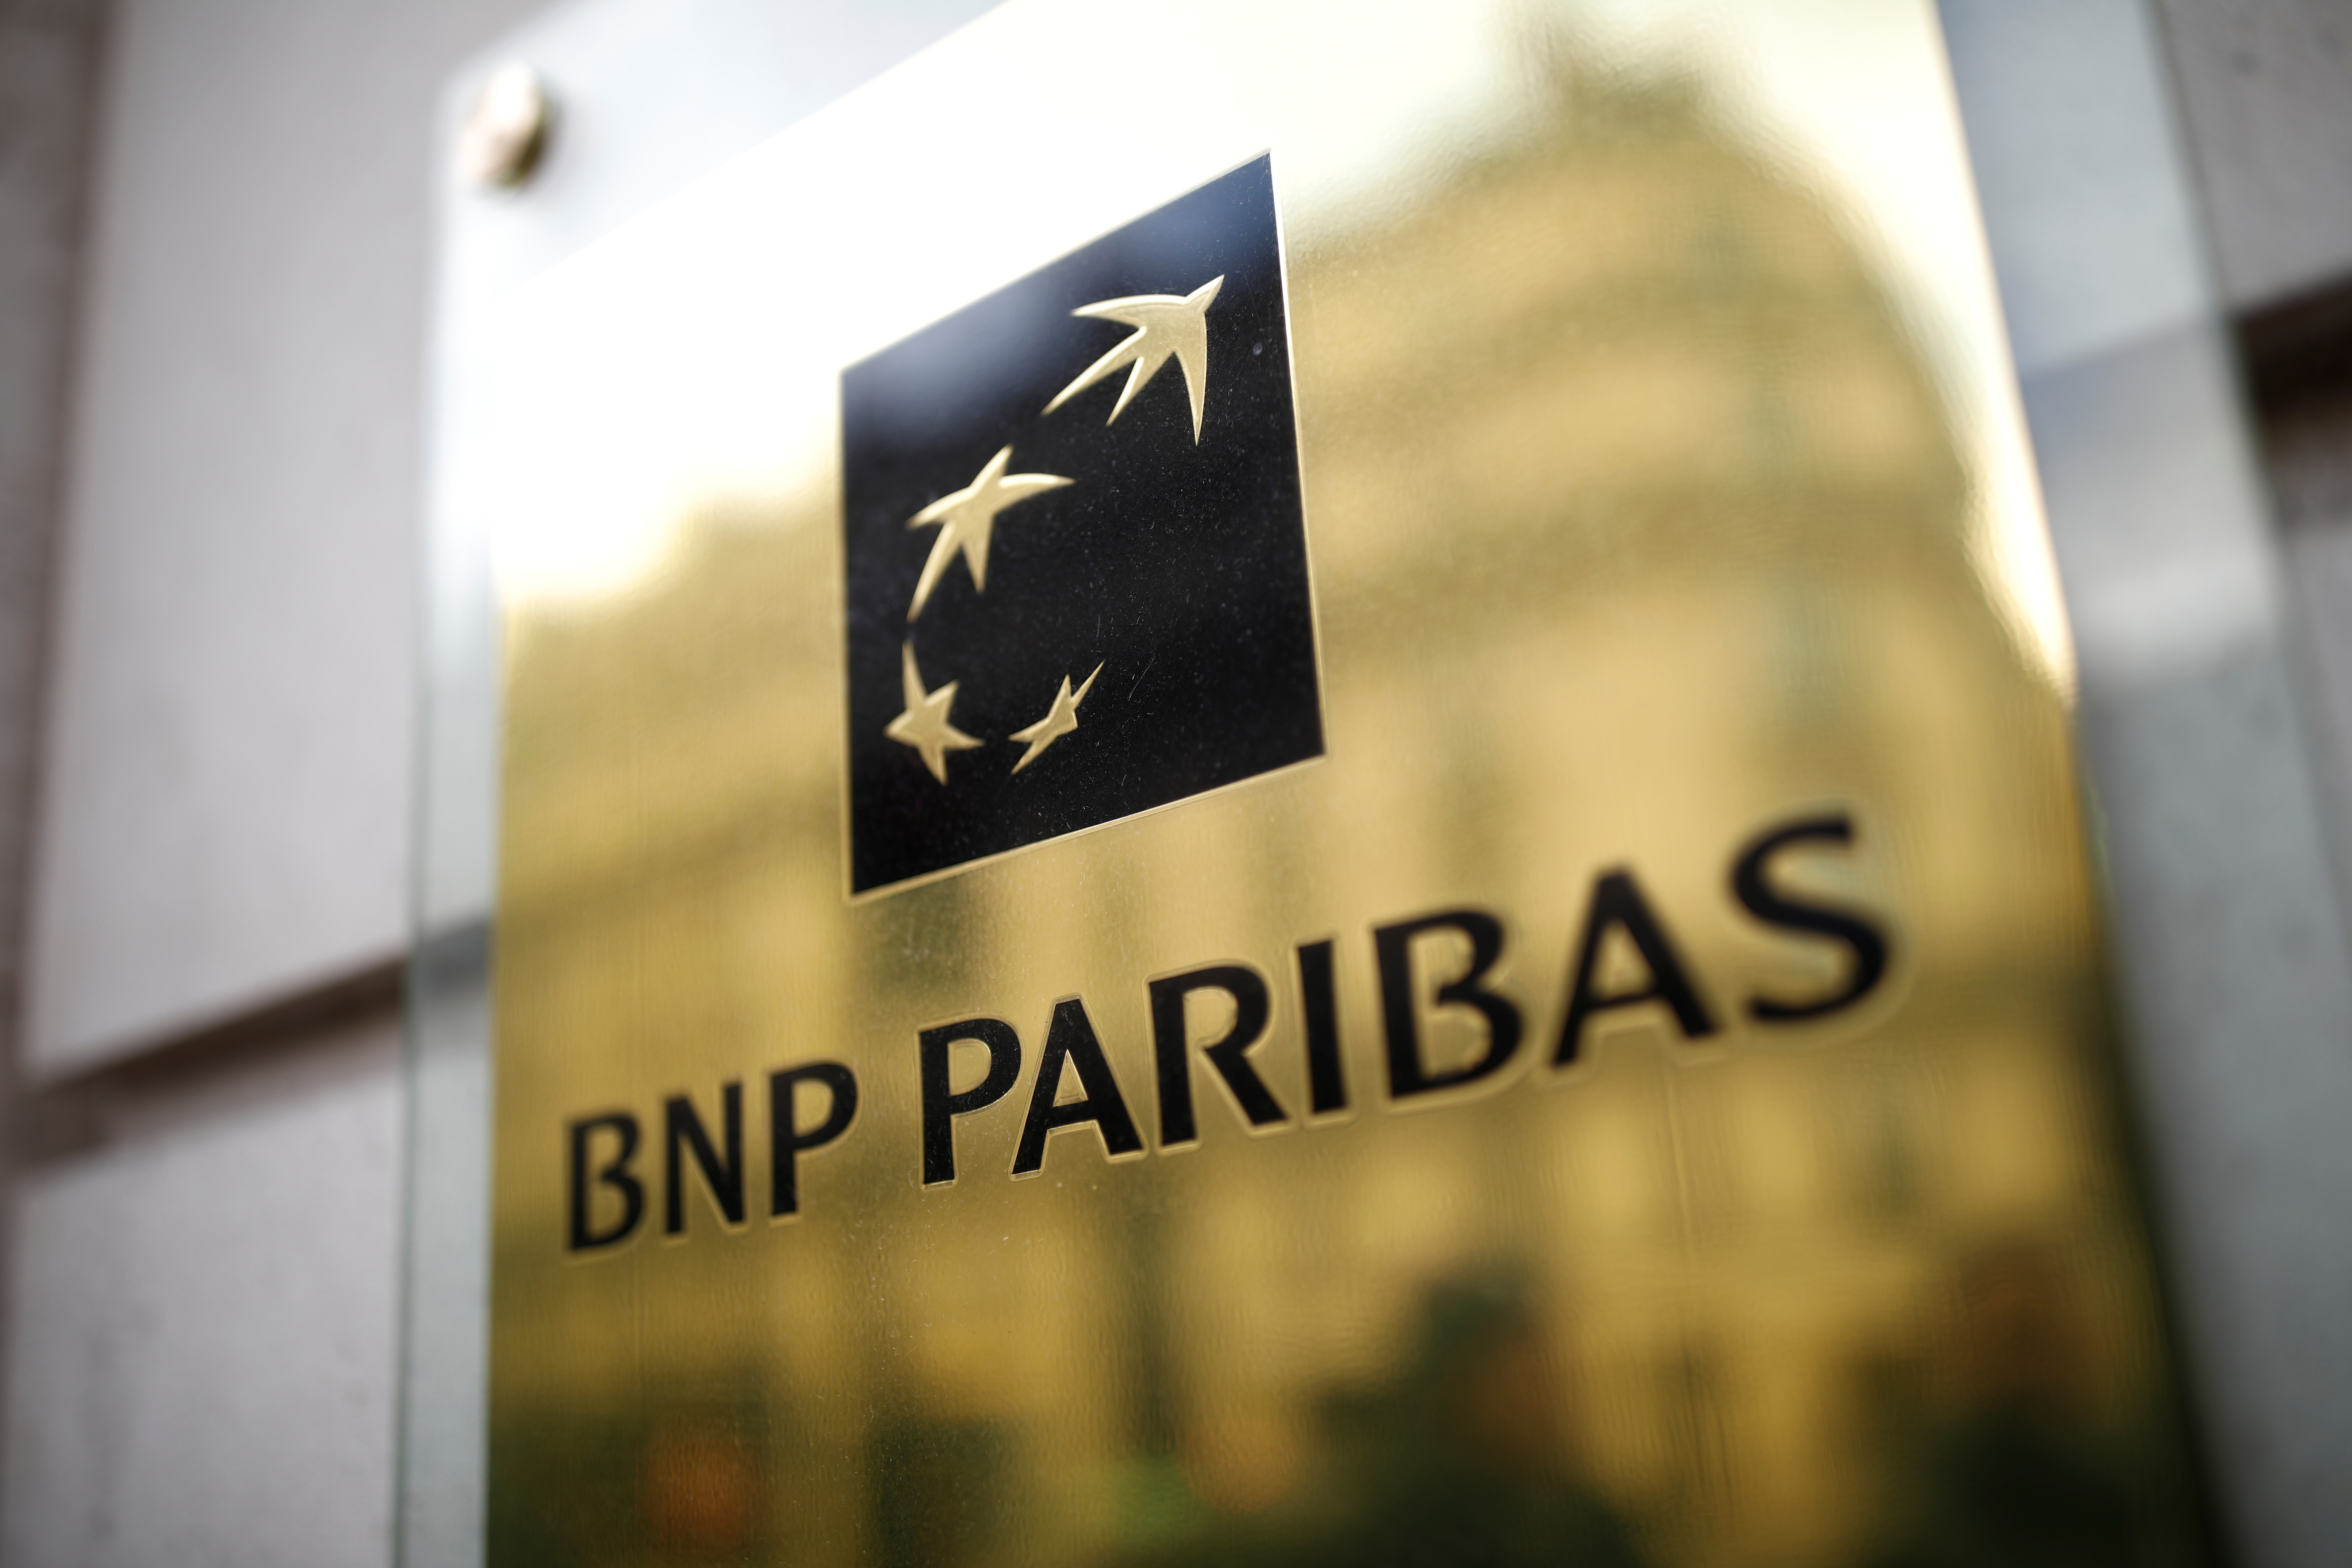 The BNP Paribas logo is seen at a branch in Paris, France, February 4, 2020. REUTERS/Benoit Tessier